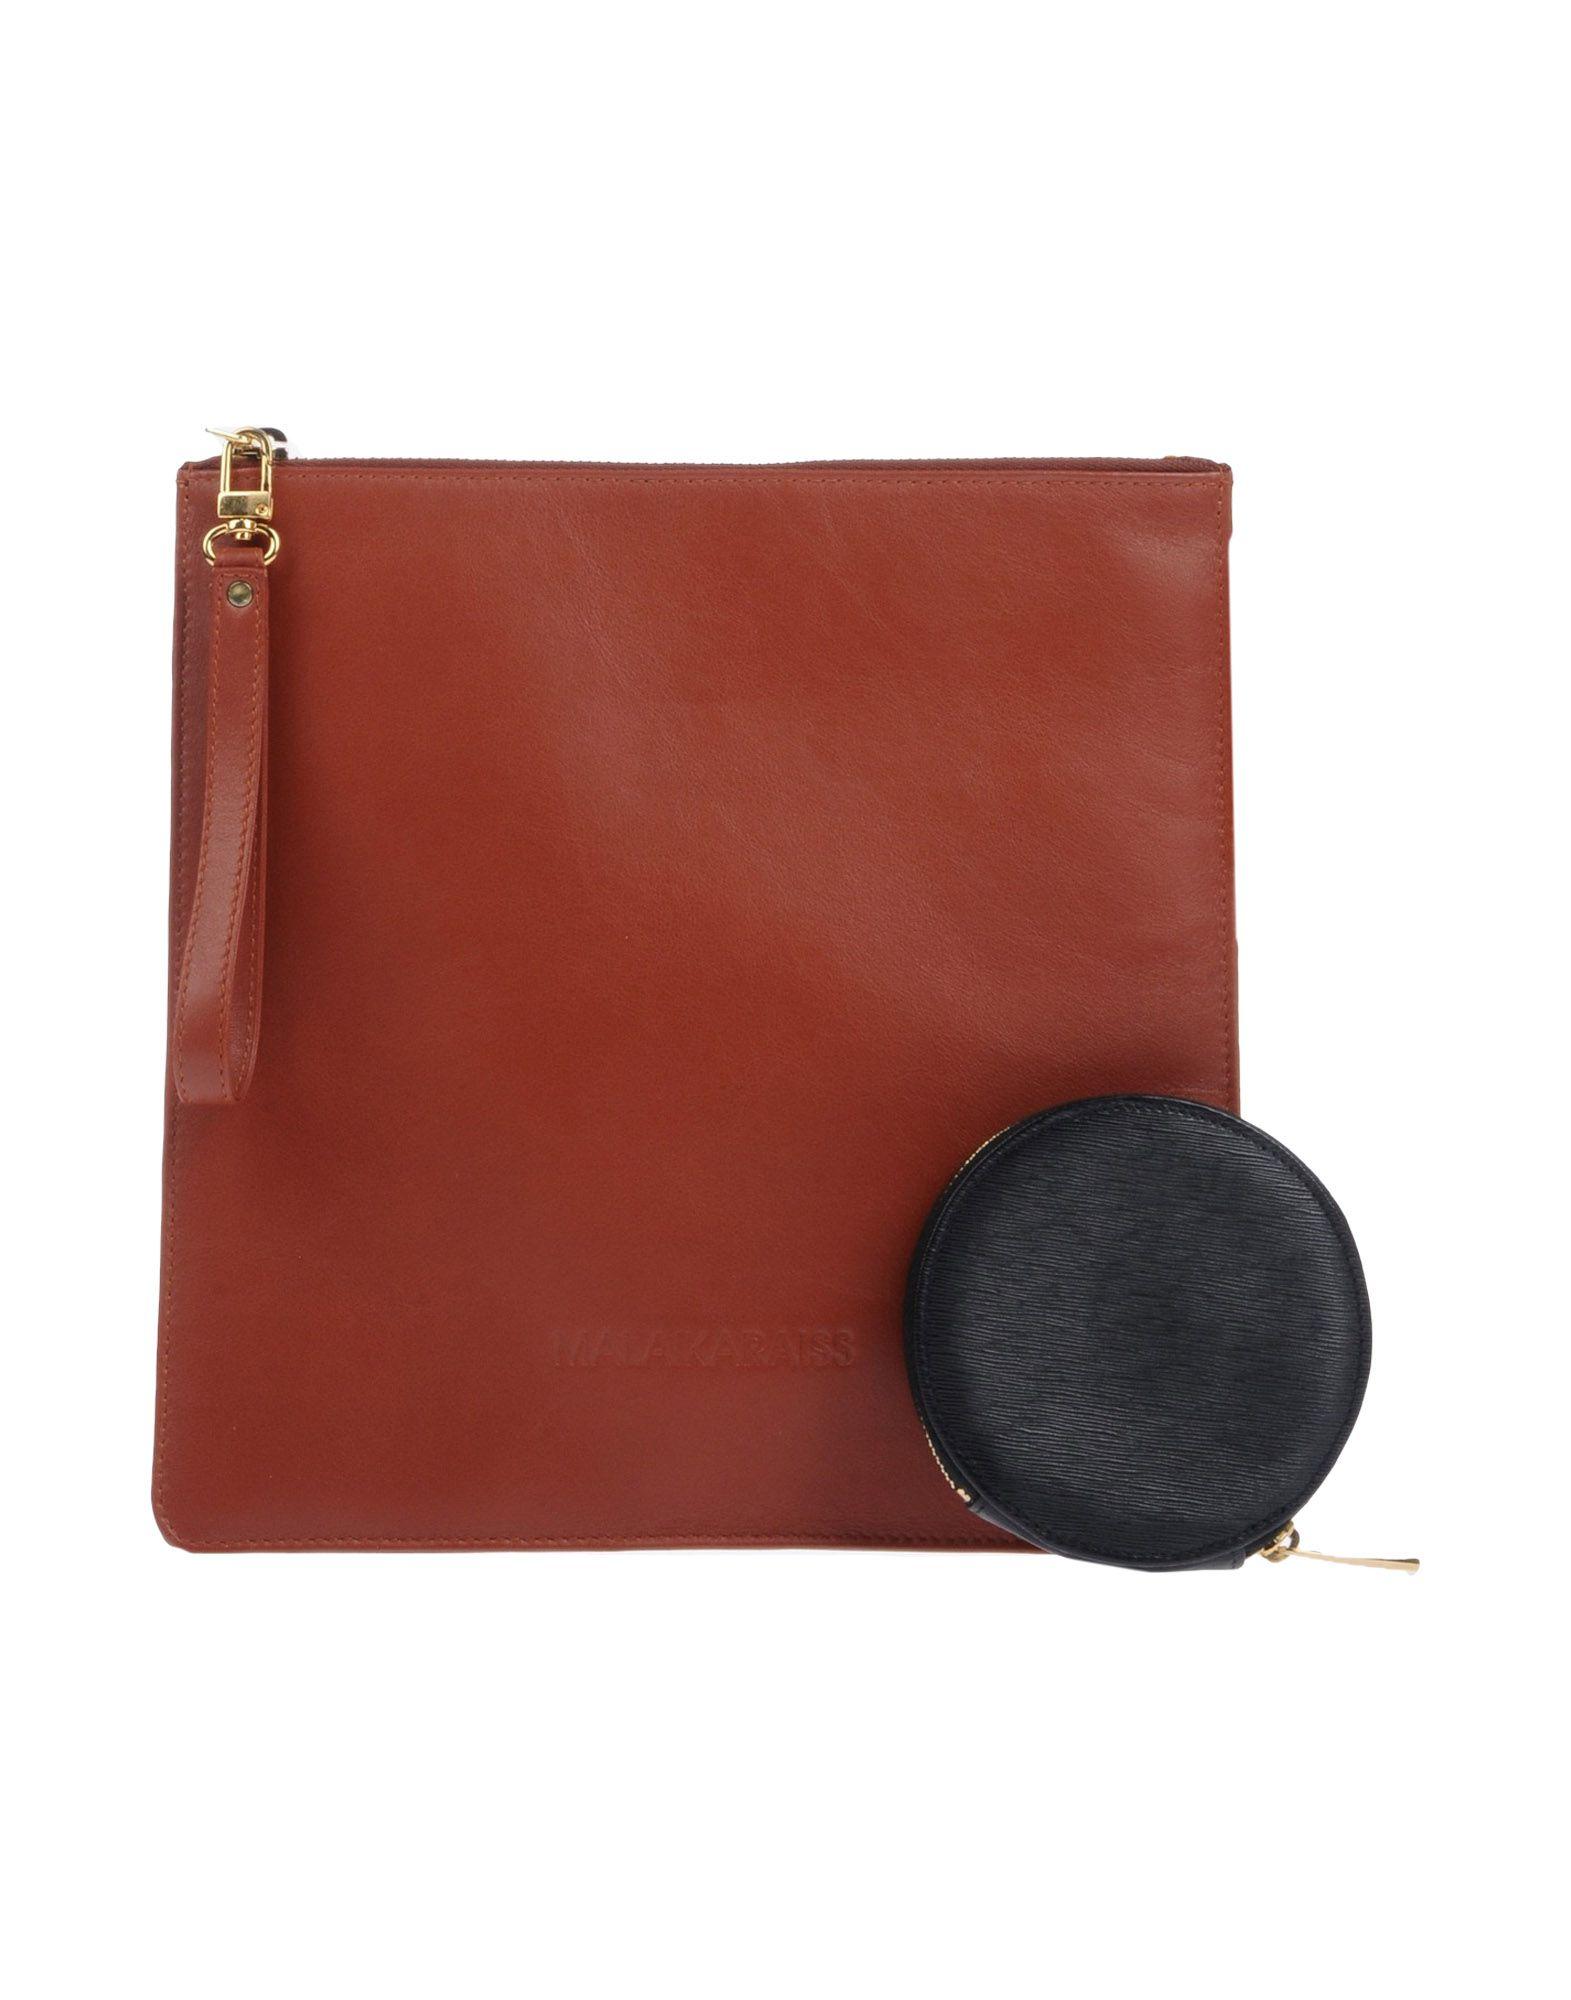 MALAIKA RAISS Handbag in Brown